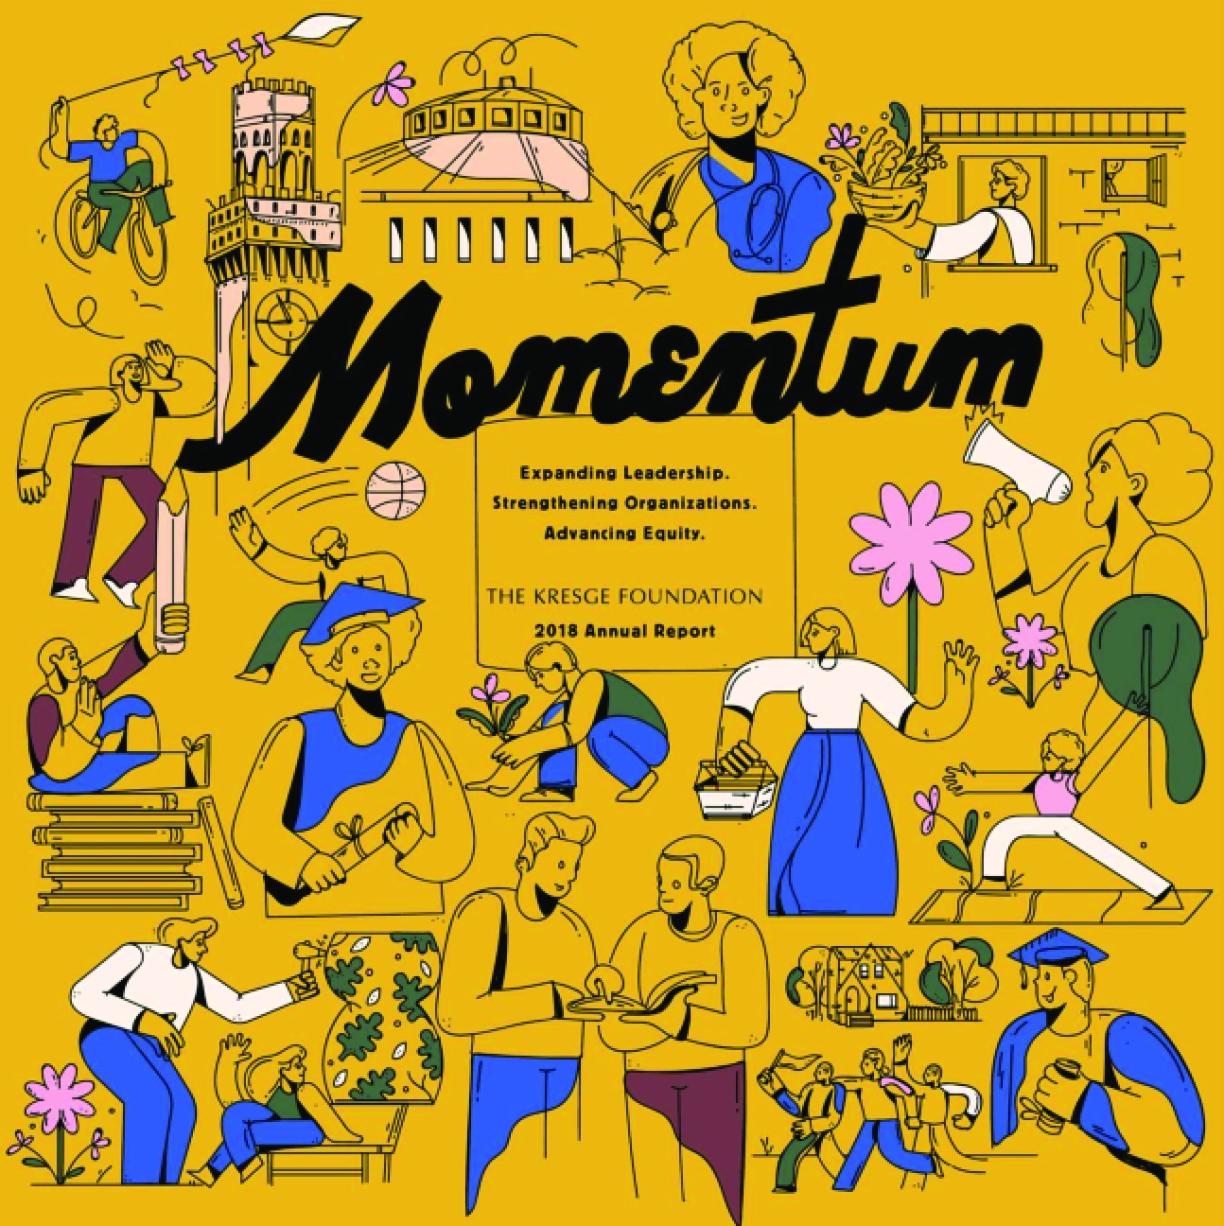 Momentum: Expanding Leadership - Strengthening Organizations - Advancing Equity